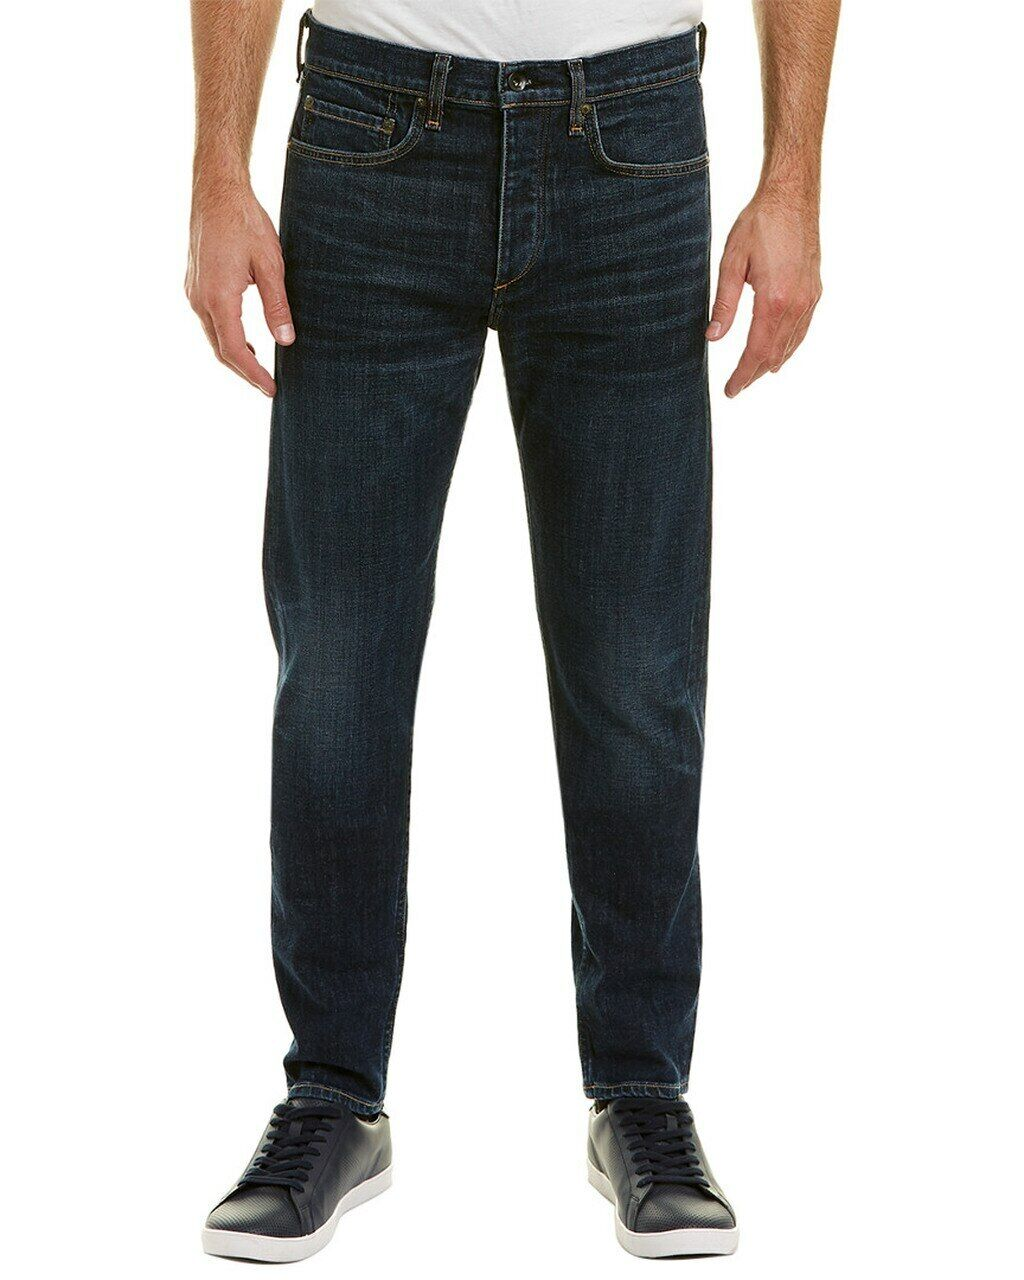 Rag & Bone Men's Jeans NWT  250 Glastonbury Fit 3 Classic 29 30x33 Button Fly